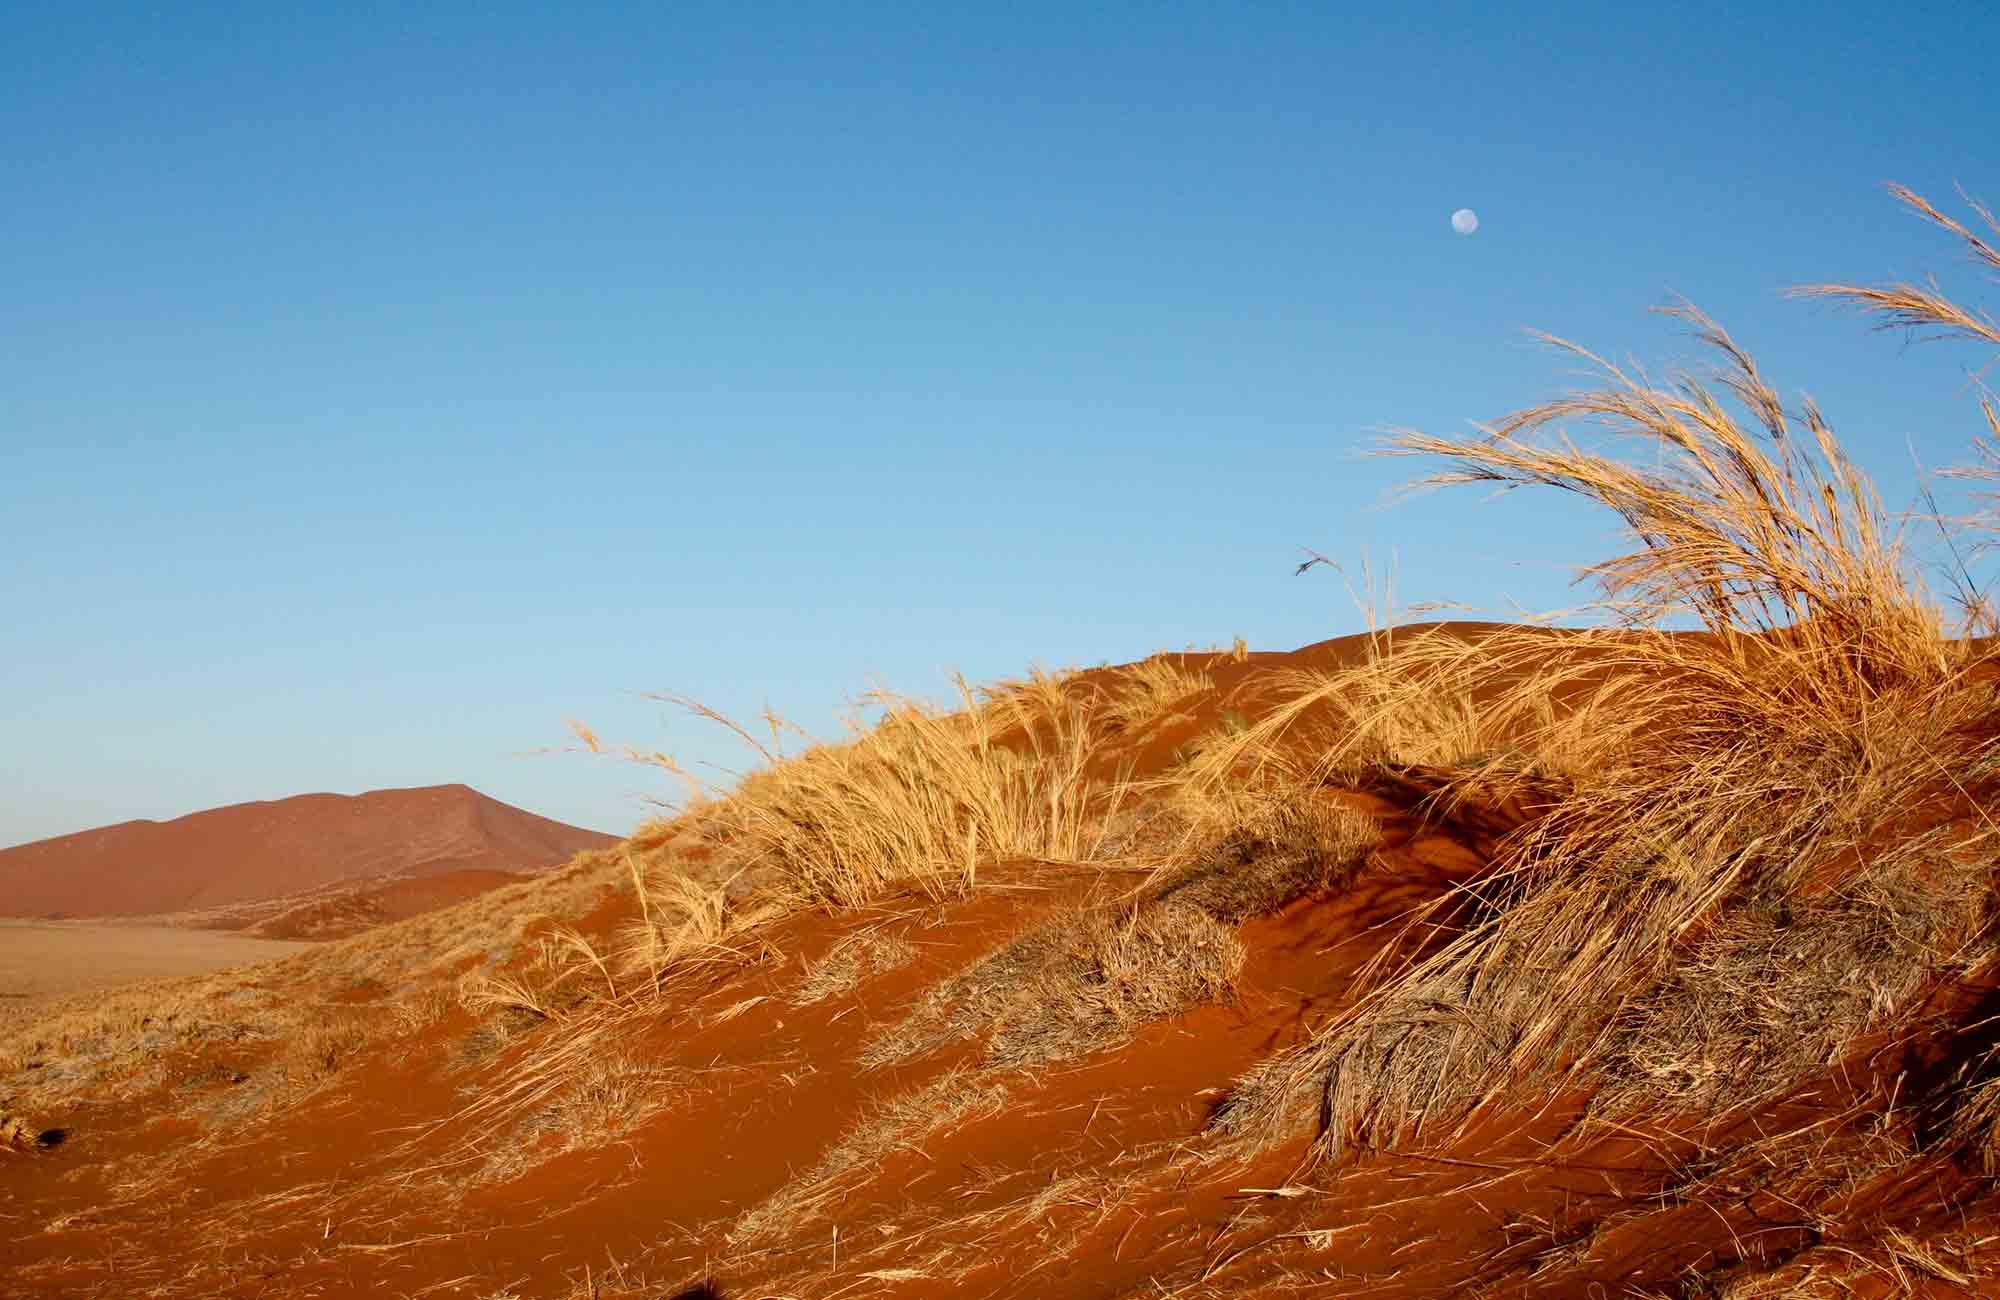 Voyage Namibie - Dunes rouges Désert du Namib - Amplitudes